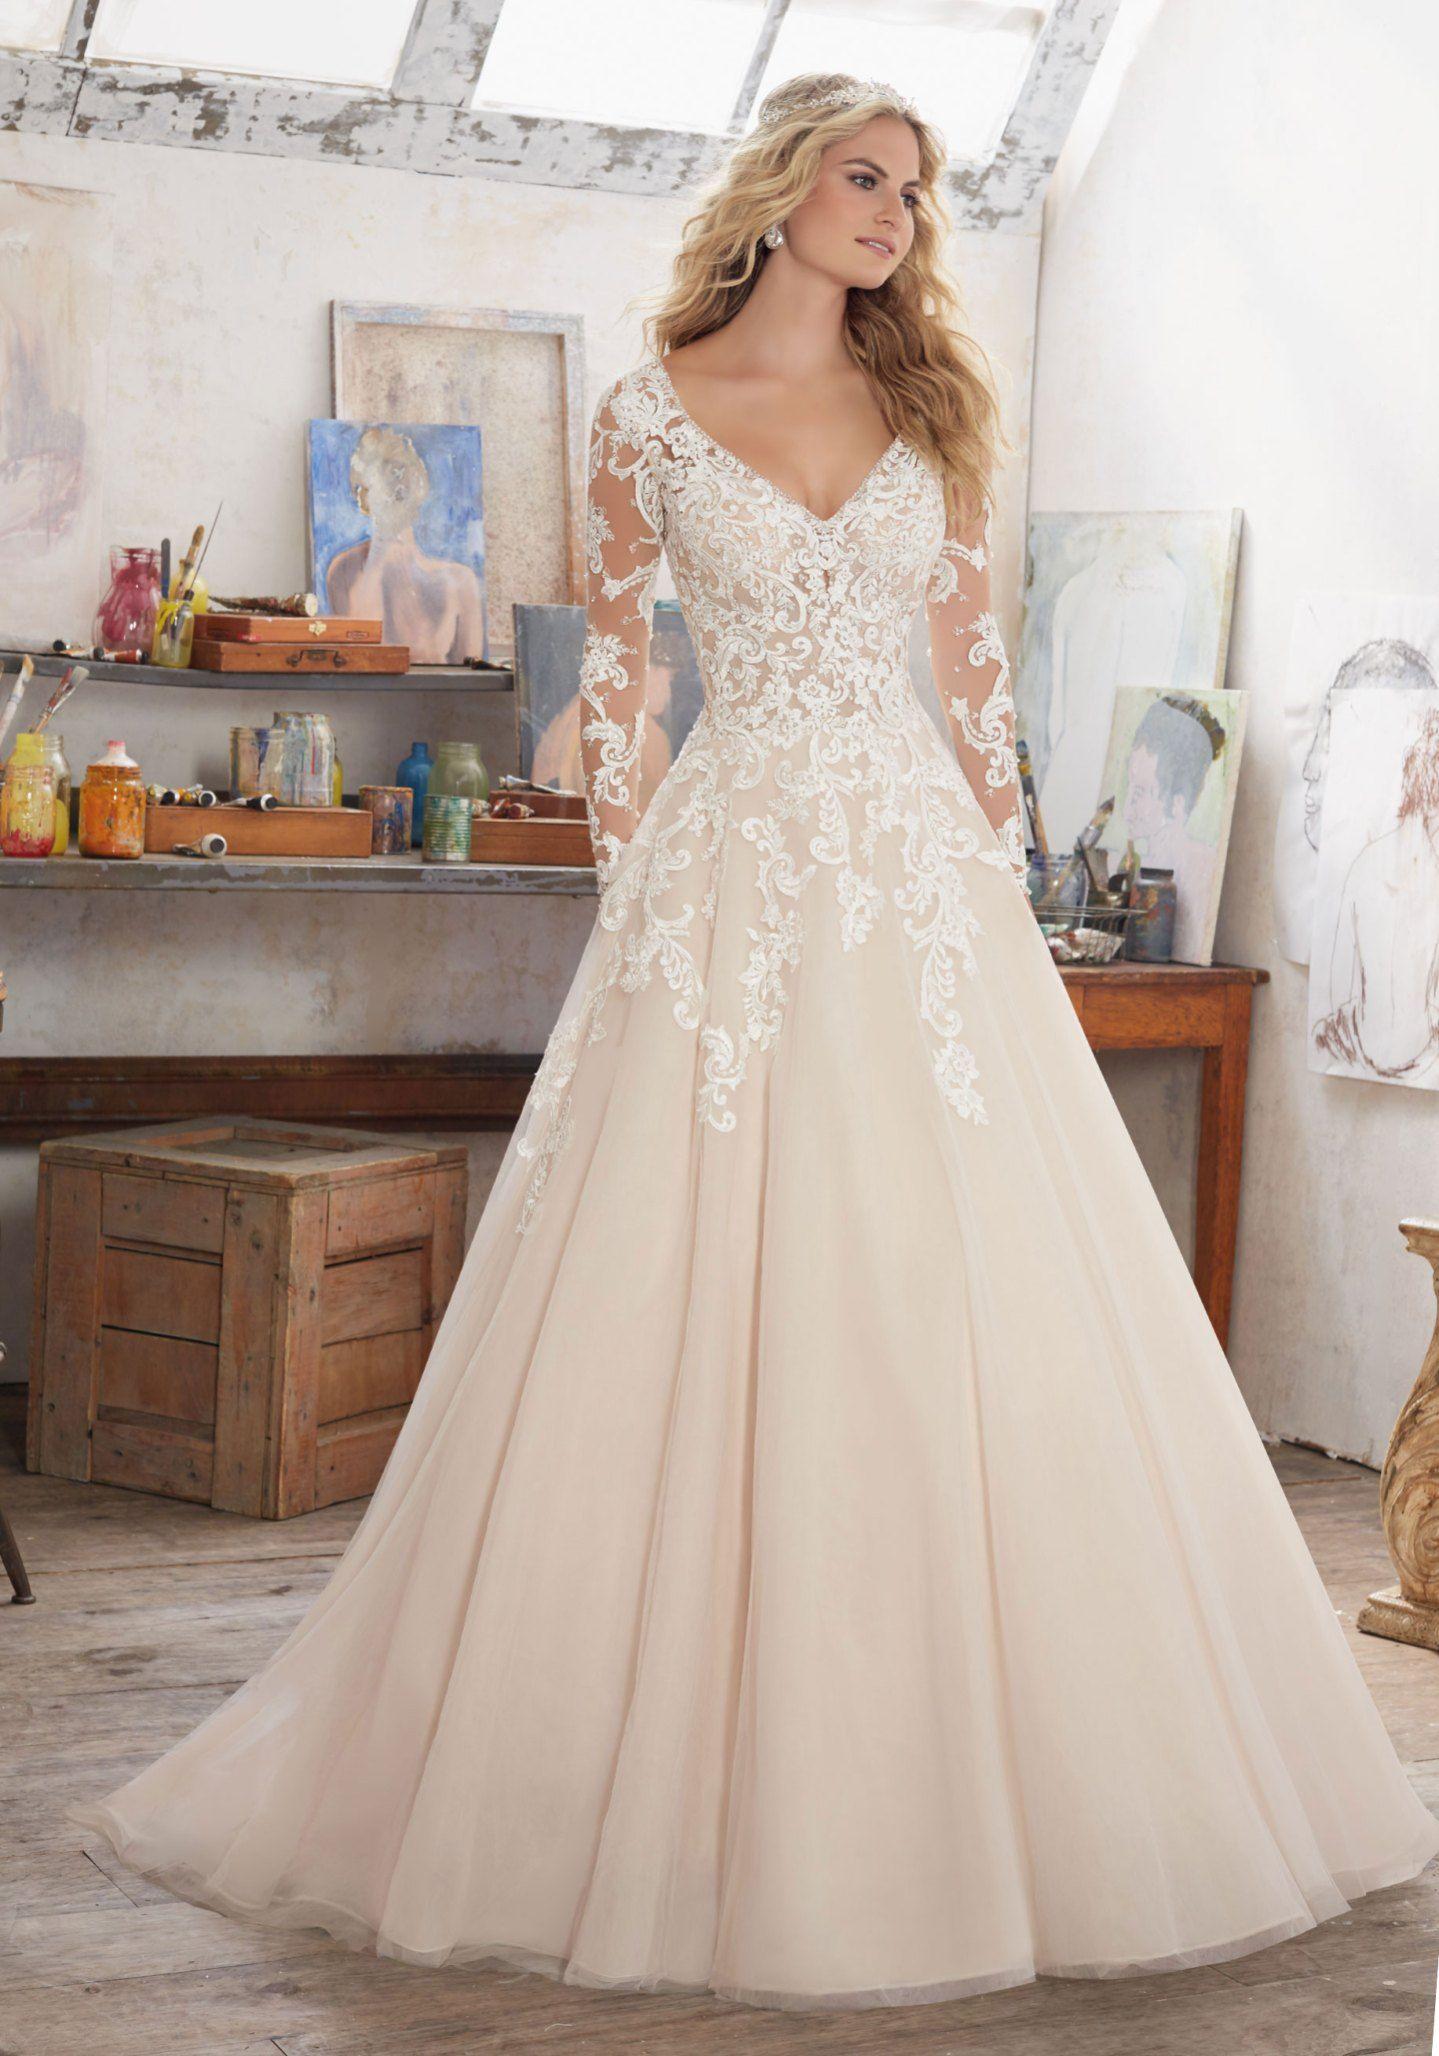 Beautiful long sleeve wedding dresses wedding dresses in